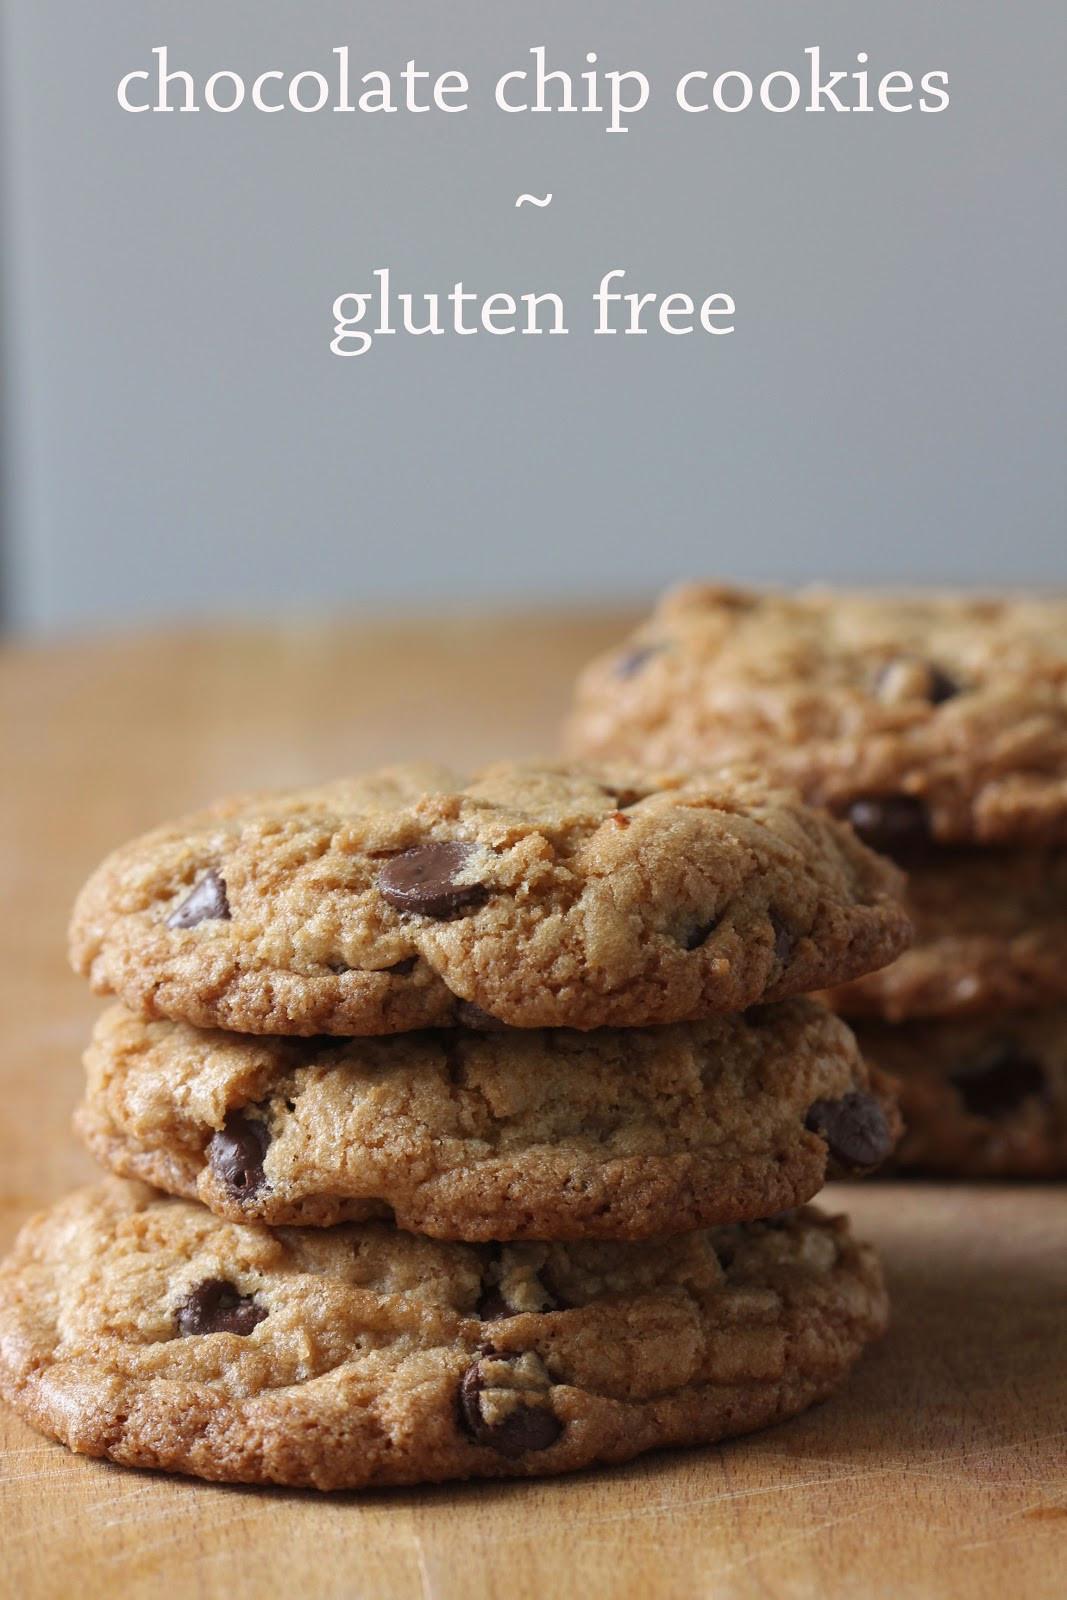 Gluten Free Chocolate Chip Cookies  Chocolate Chip Cookies Gluten Free